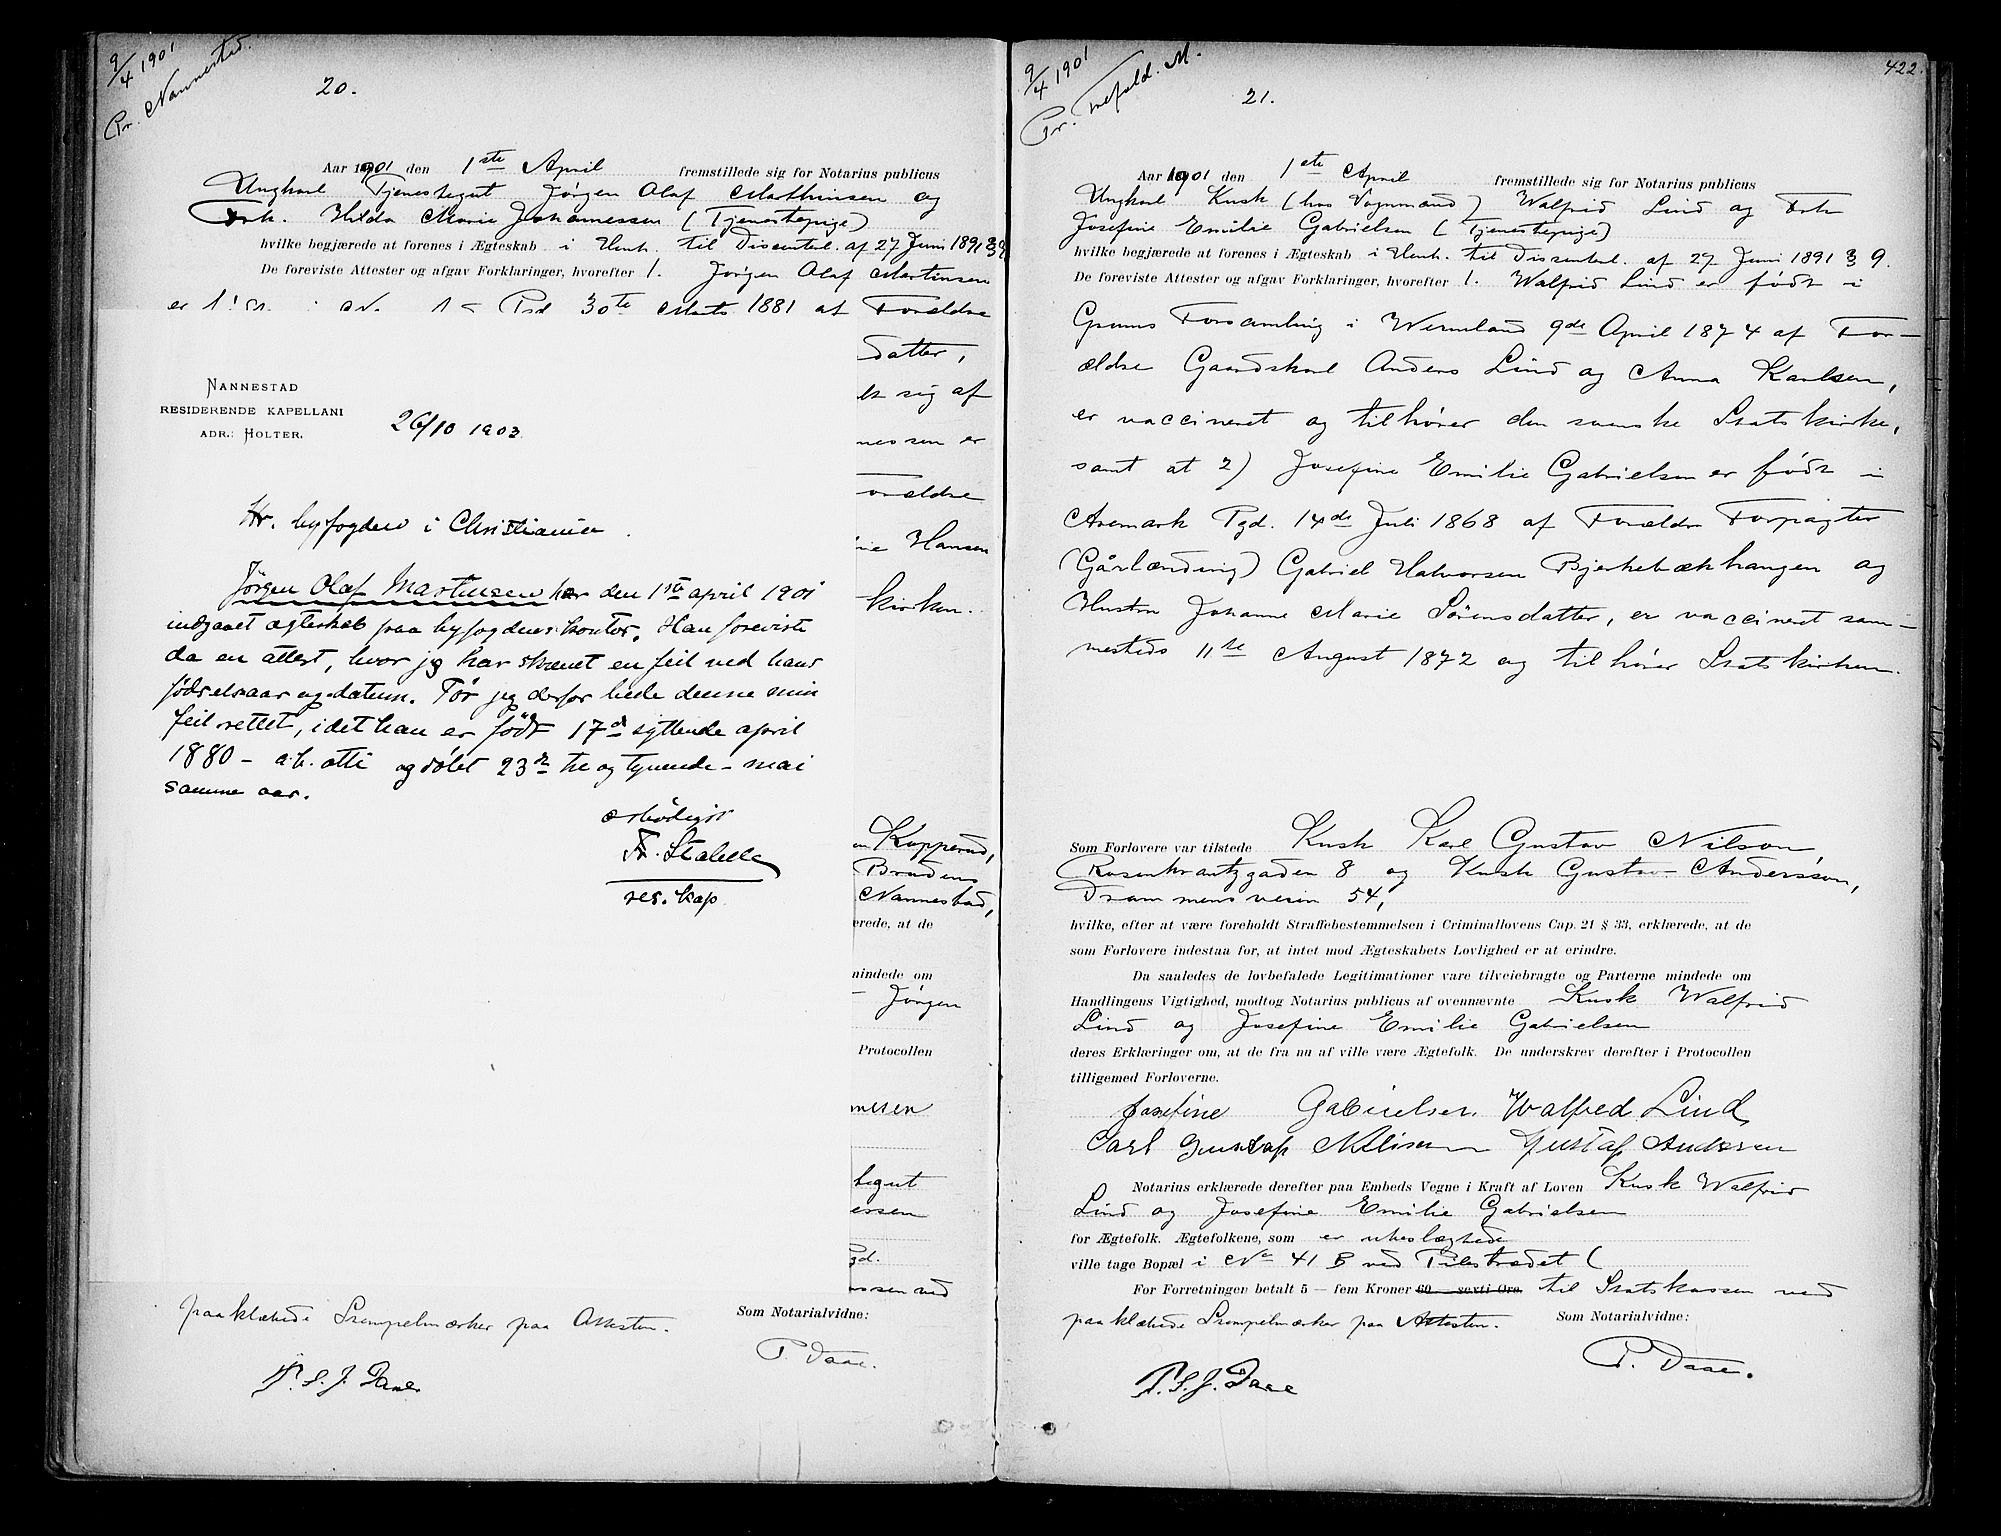 SAO, Oslo byfogd avd. I, L/Lb/Lbb/L0005: Notarialprotokoll, rekke II: Vigsler, 1897-1902, s. 421b-422a